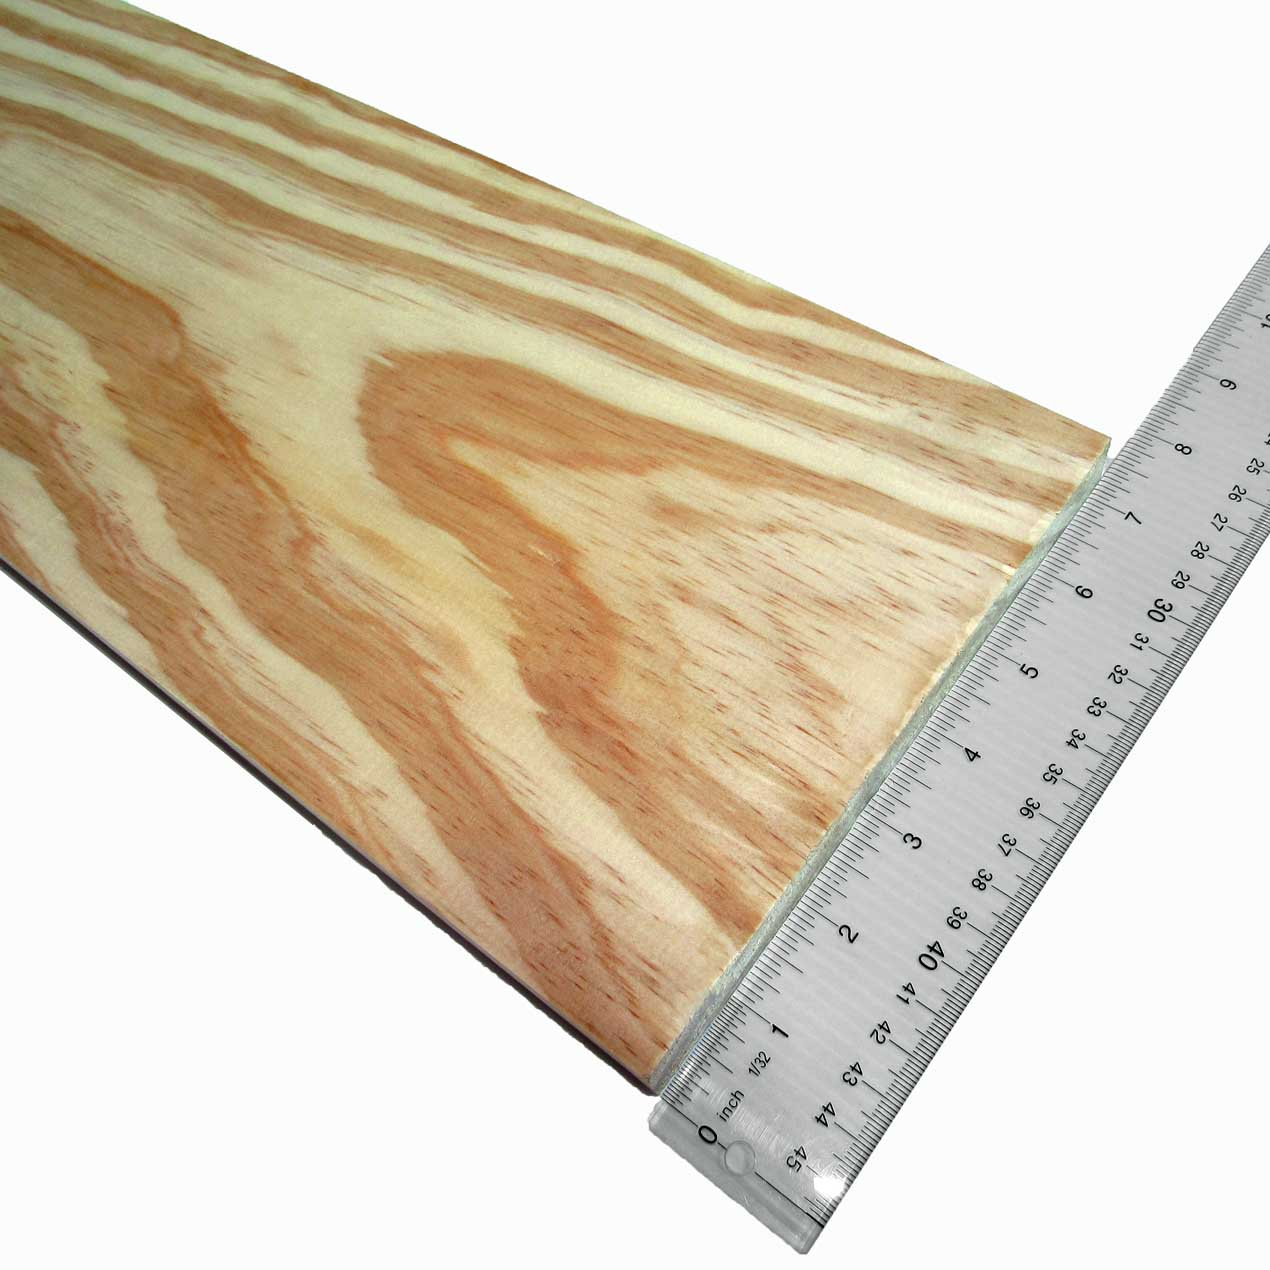 1 Inch X 8 Inch X 12 Ft Yellow Pine Yp P 105 Drop Siding Lumber Lap Siding Wood Siding